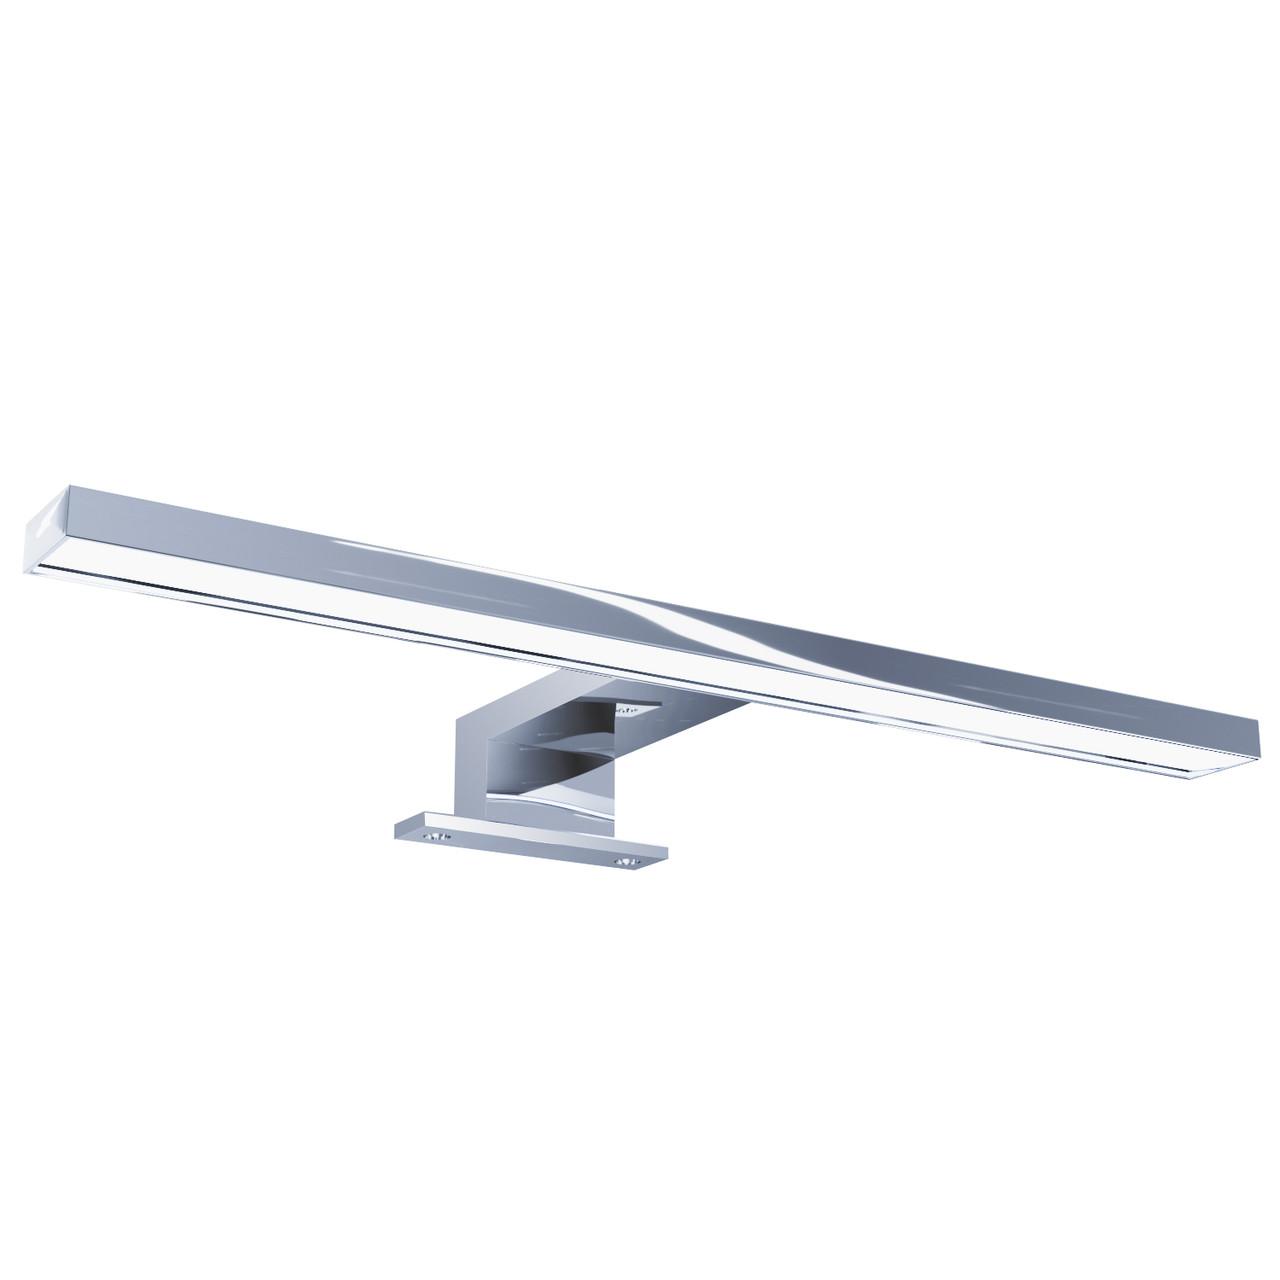 Светильник LED для ванной Sanwerk «SMART» 30 см